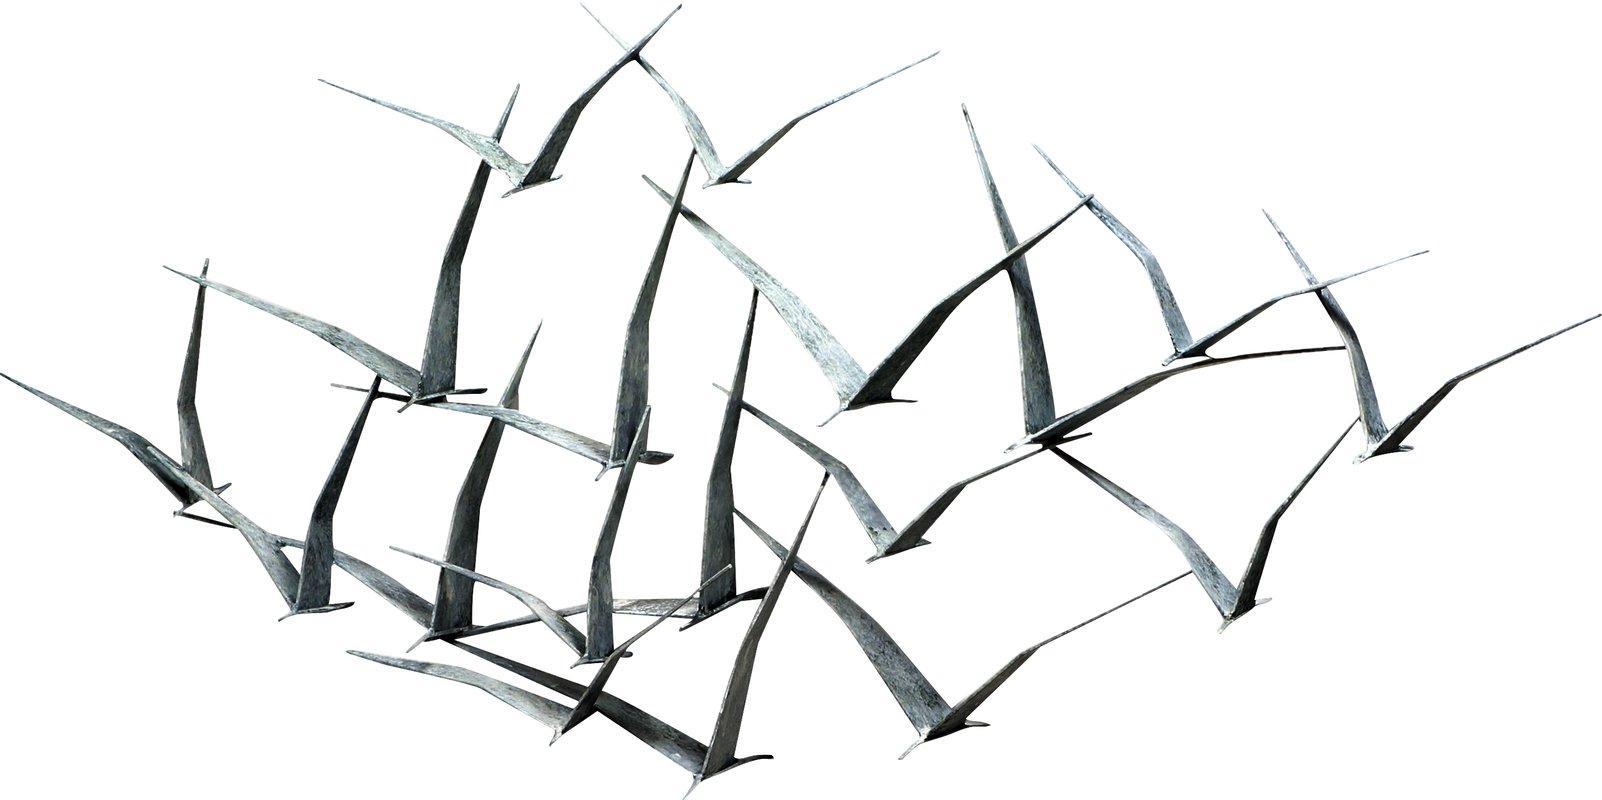 Artisan House Seagulls Wall Décor & Reviews | Wayfair Intended For Metal Wall Art Flock Of Seagulls (View 6 of 20)